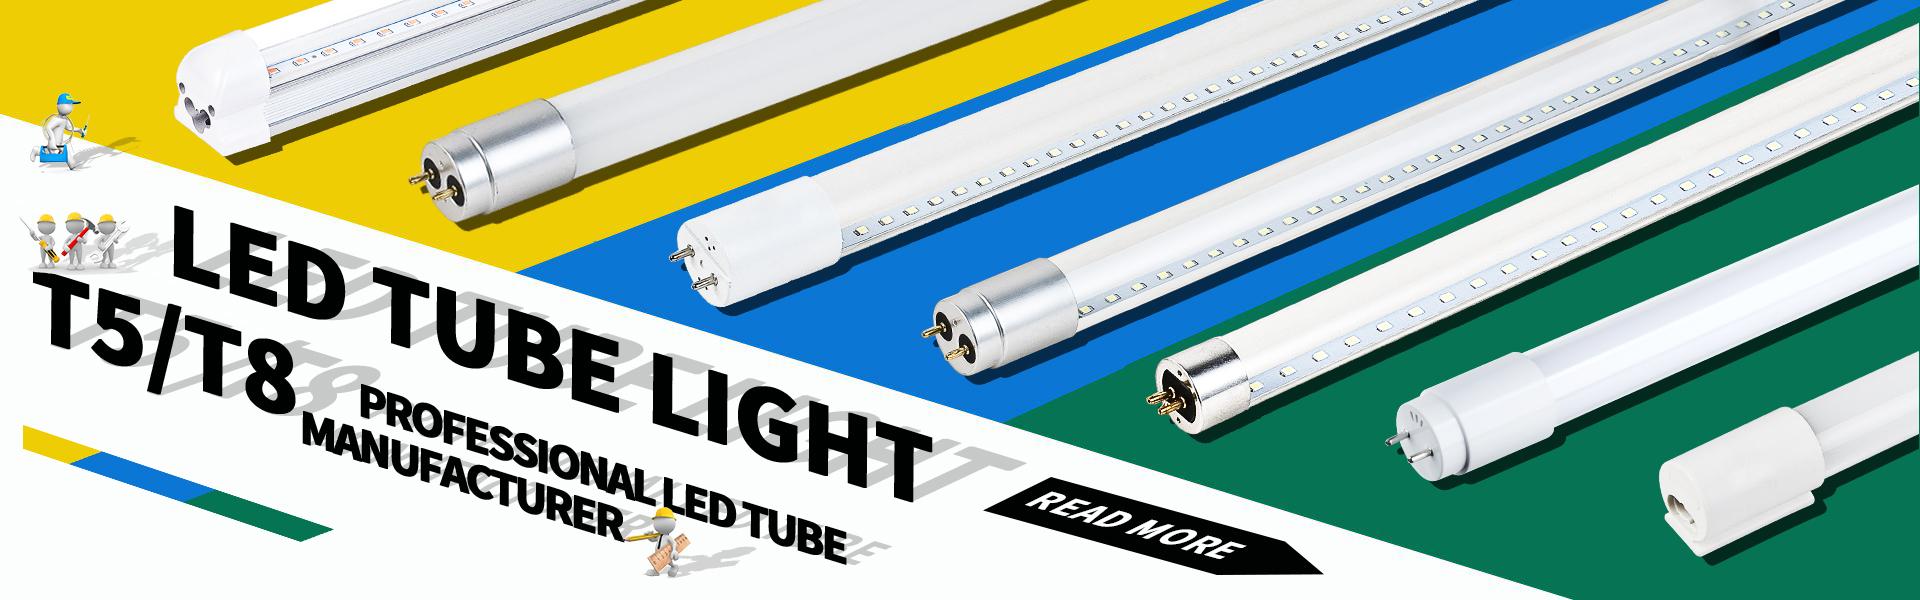 professional led tube light manufactory OEM&ODM best price